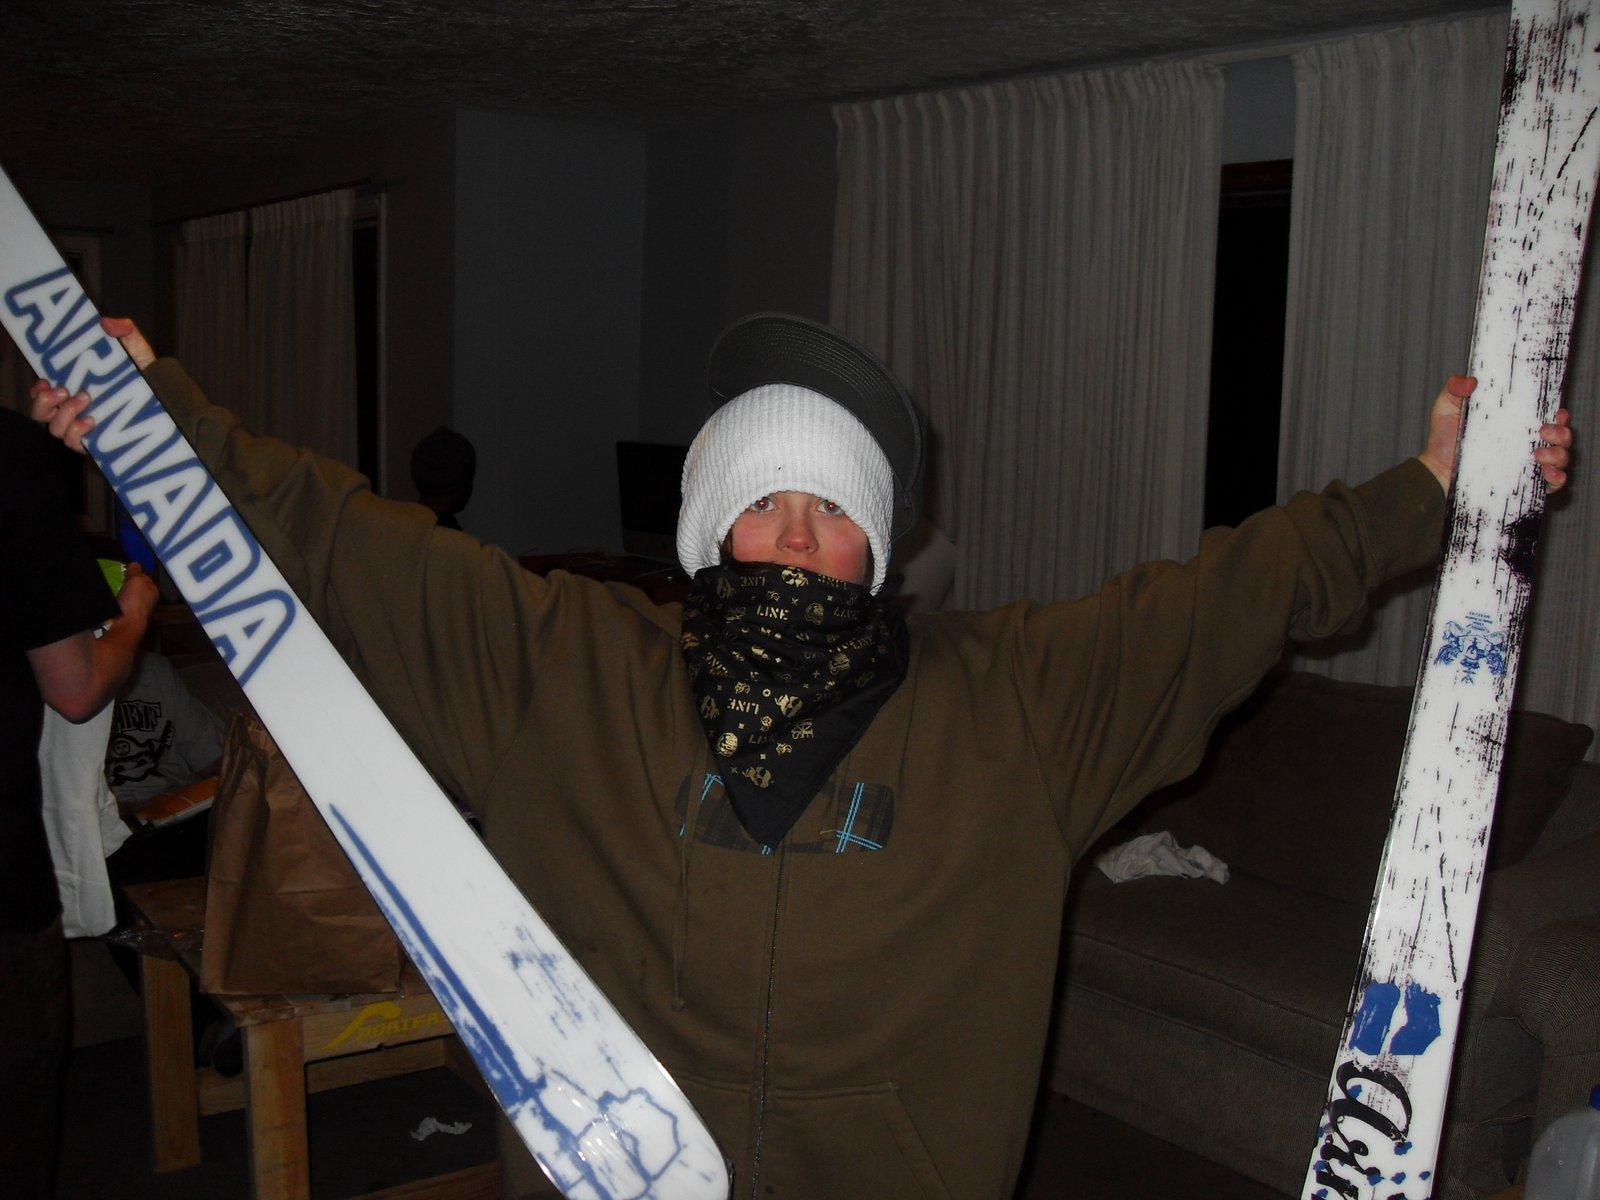 Free Skis at Windells